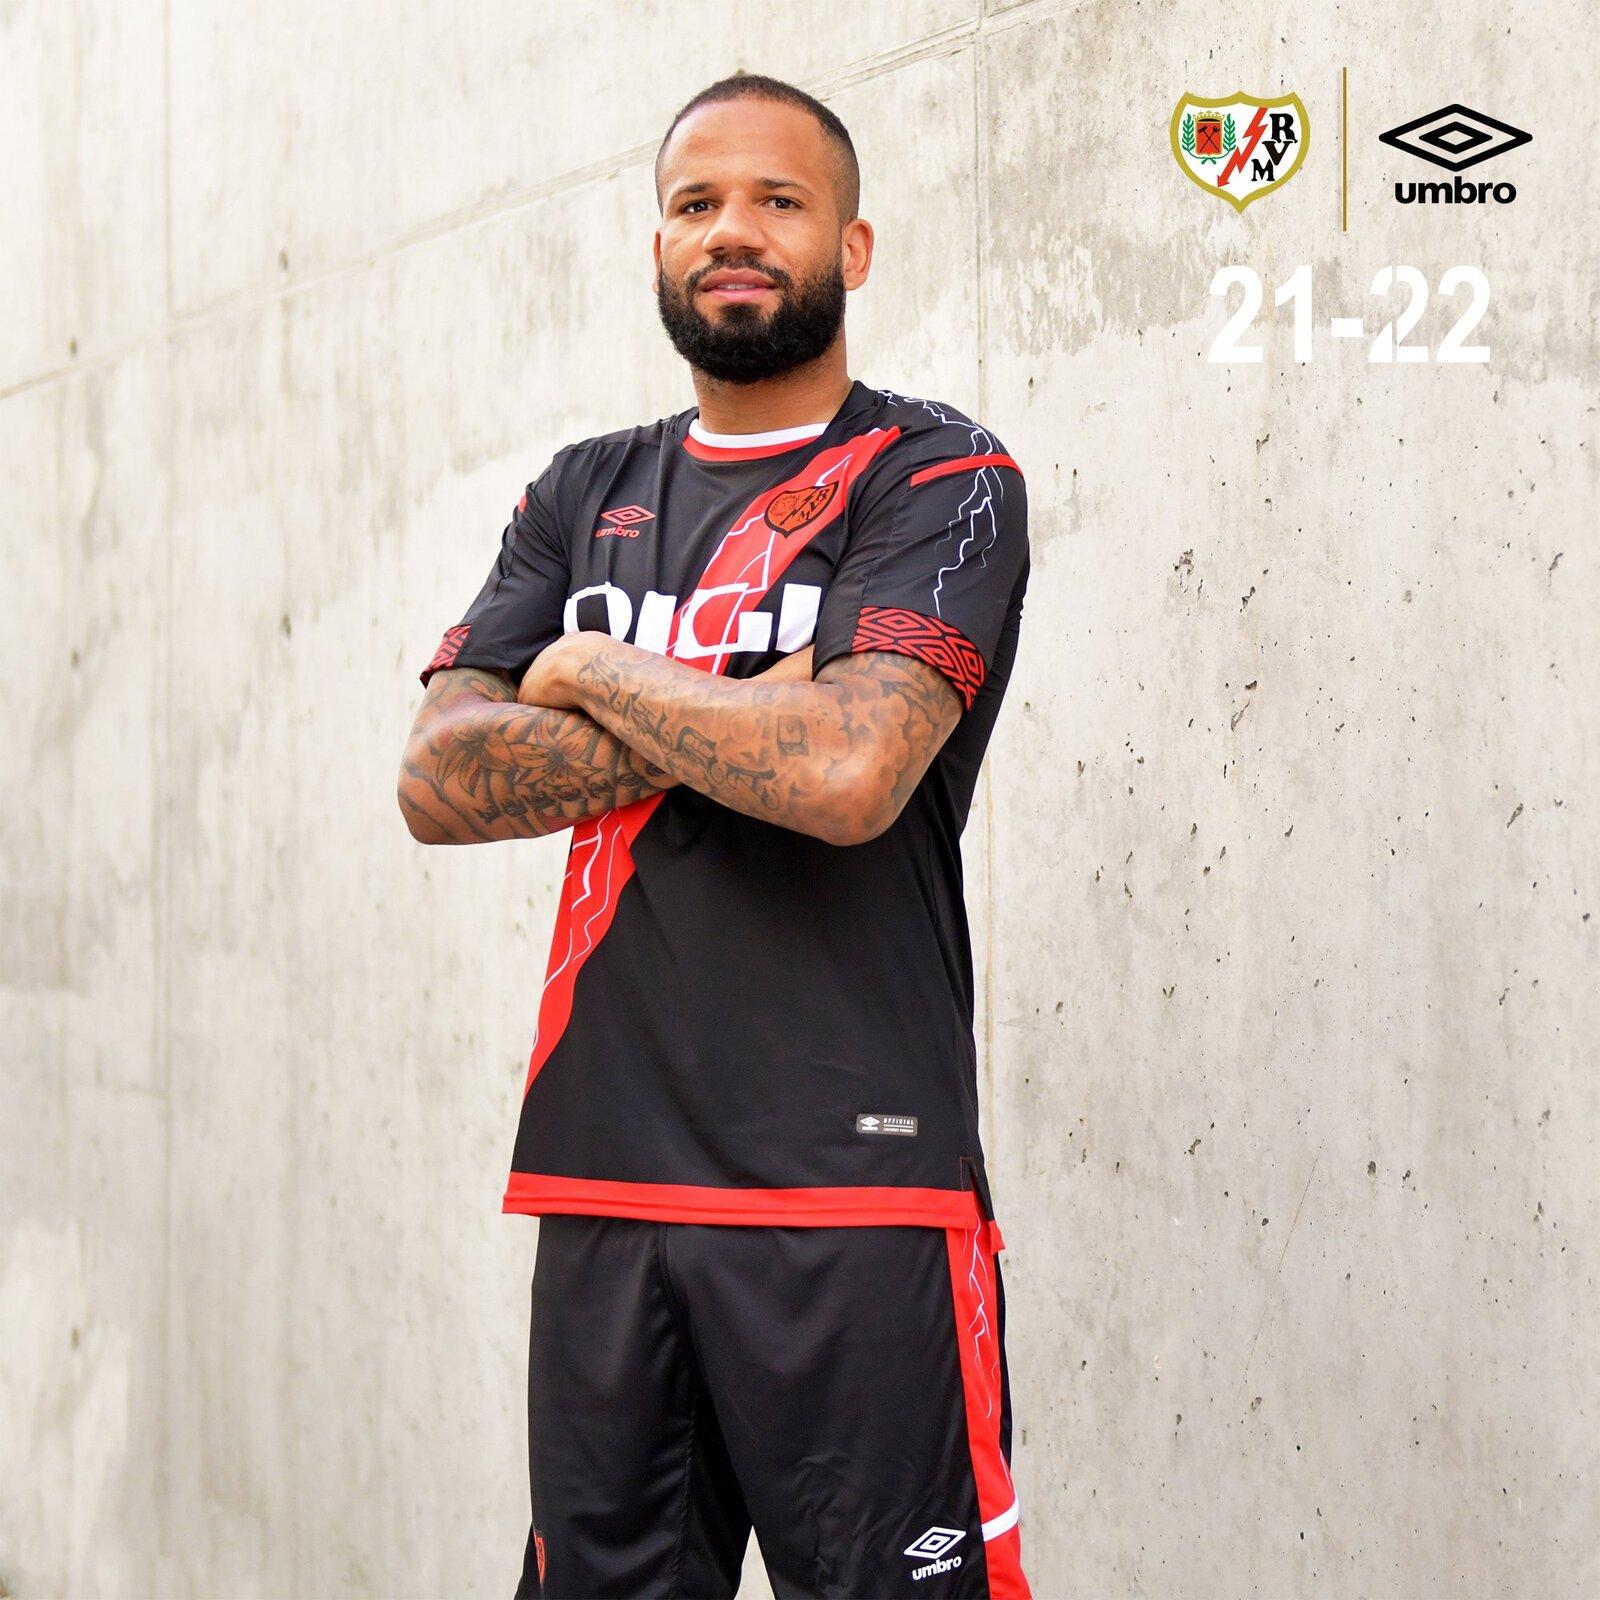 rayo_vallecano_2021_2022_shirts_c.jpeg